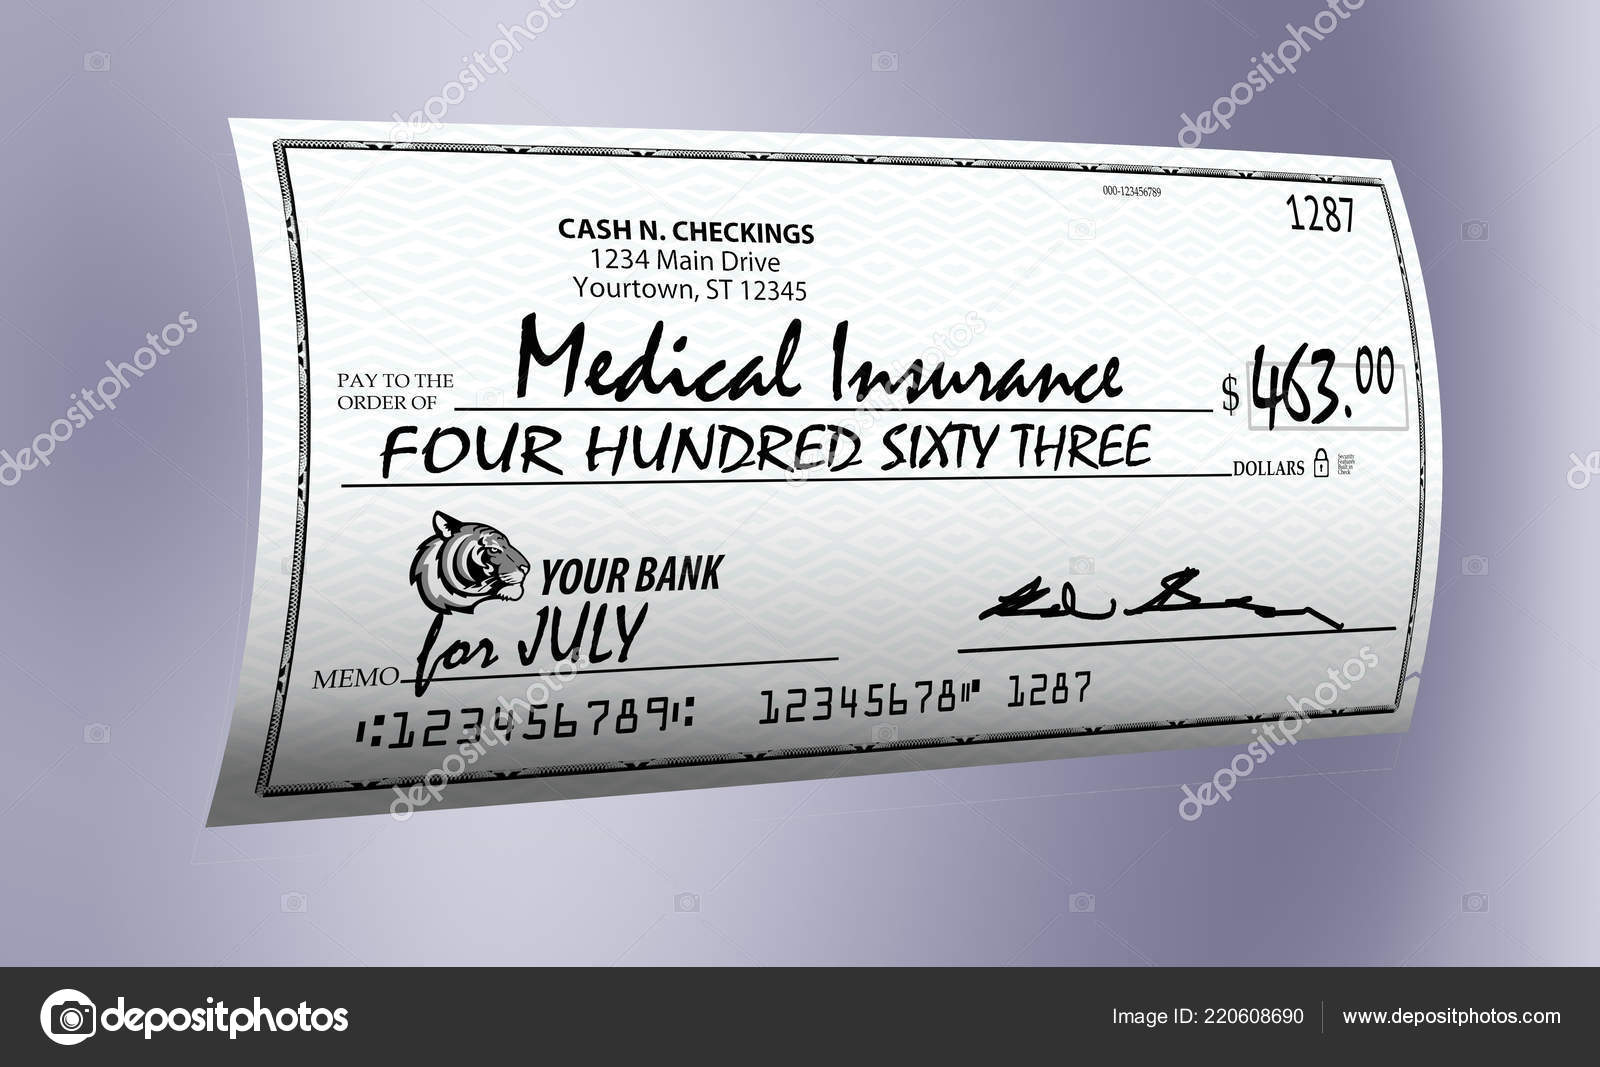 here generic mock personal bank check illustration has realism mock